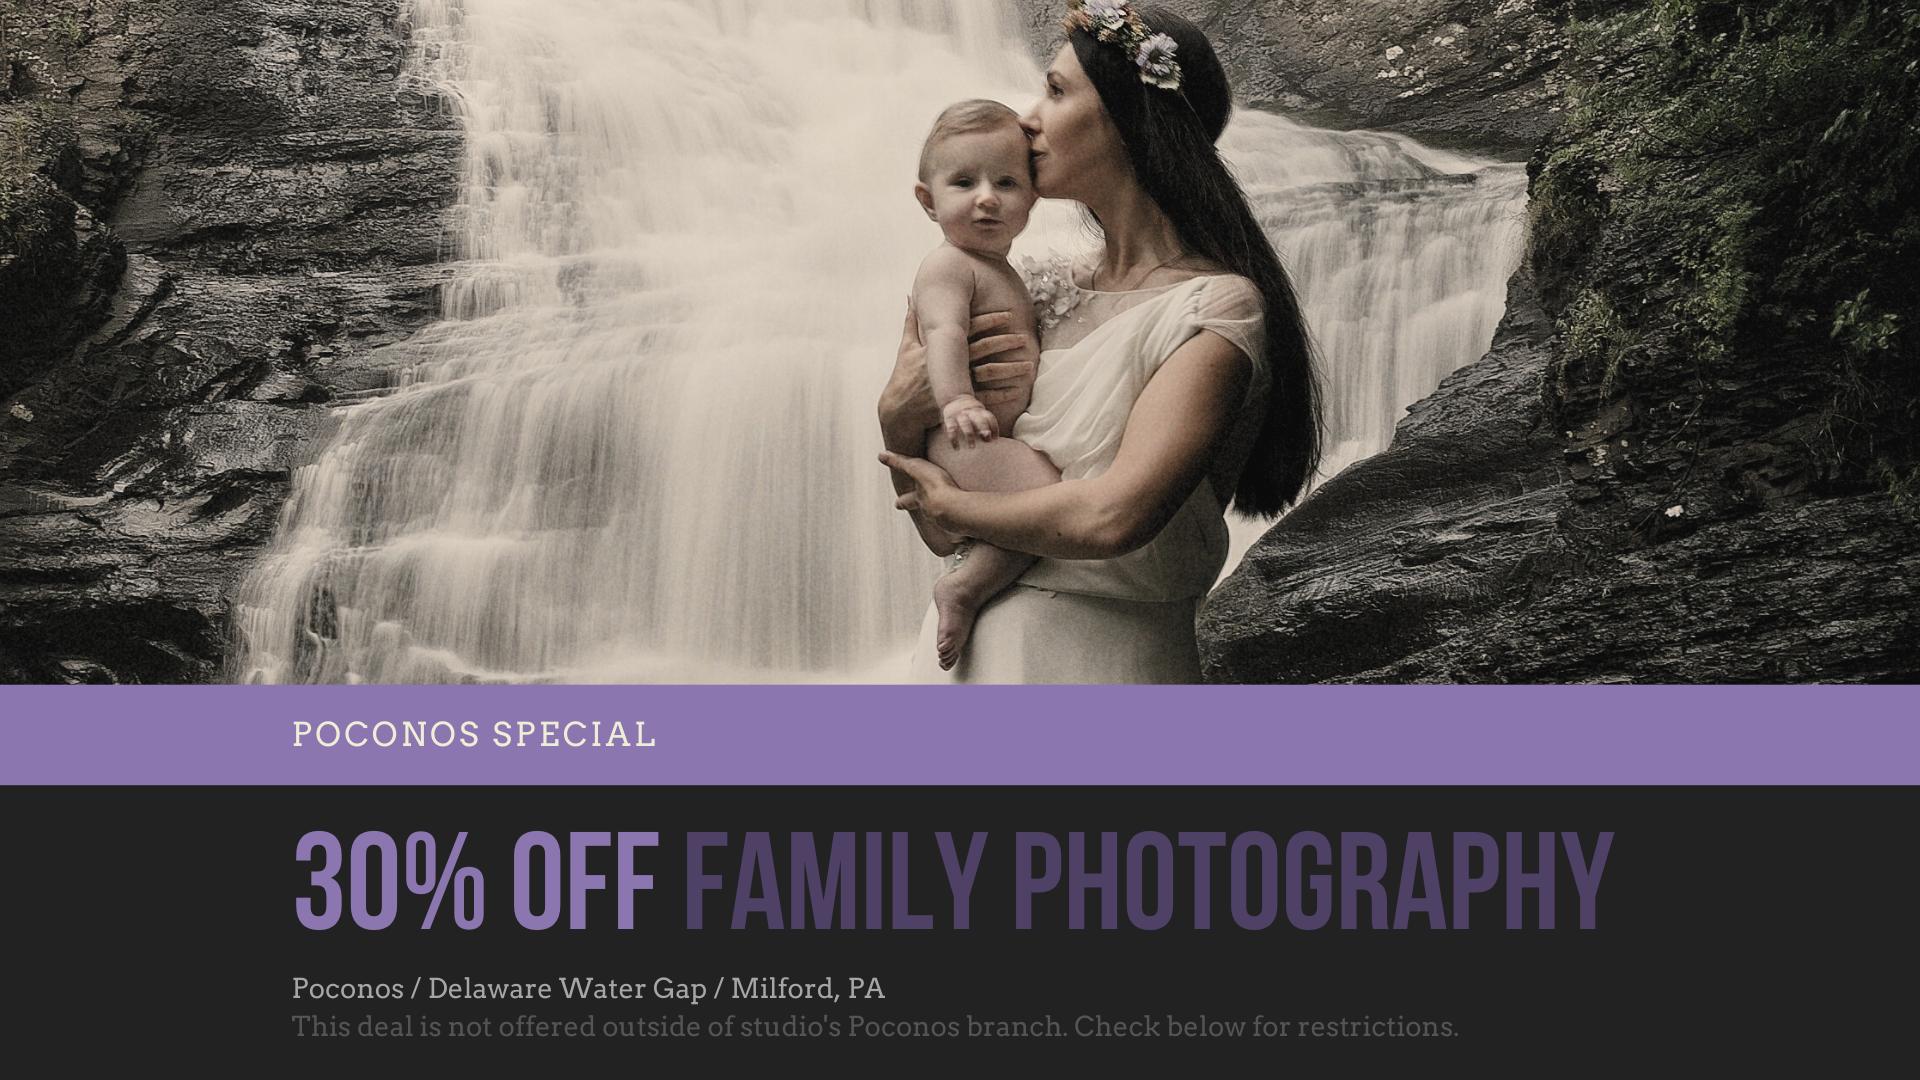 Poconos Family Photography Special